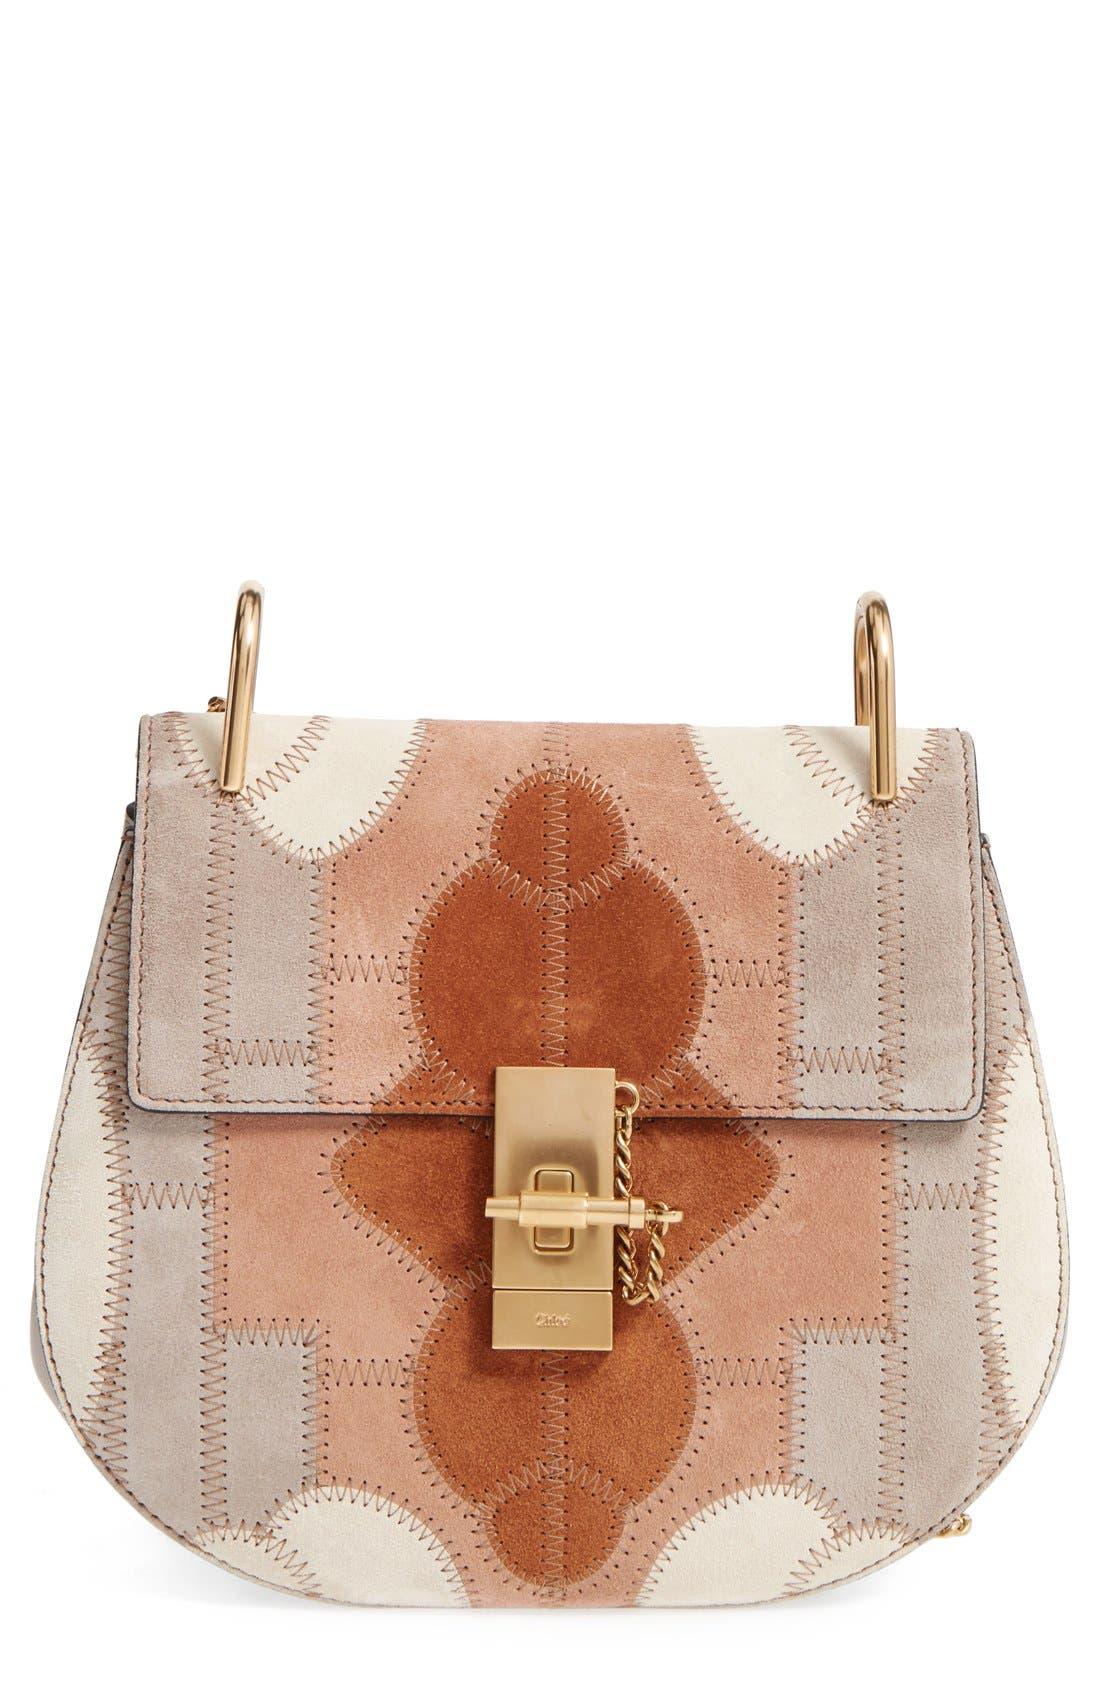 Main Image - Chloé 'Small Drew' Patchwork Suede Shoulder Bag